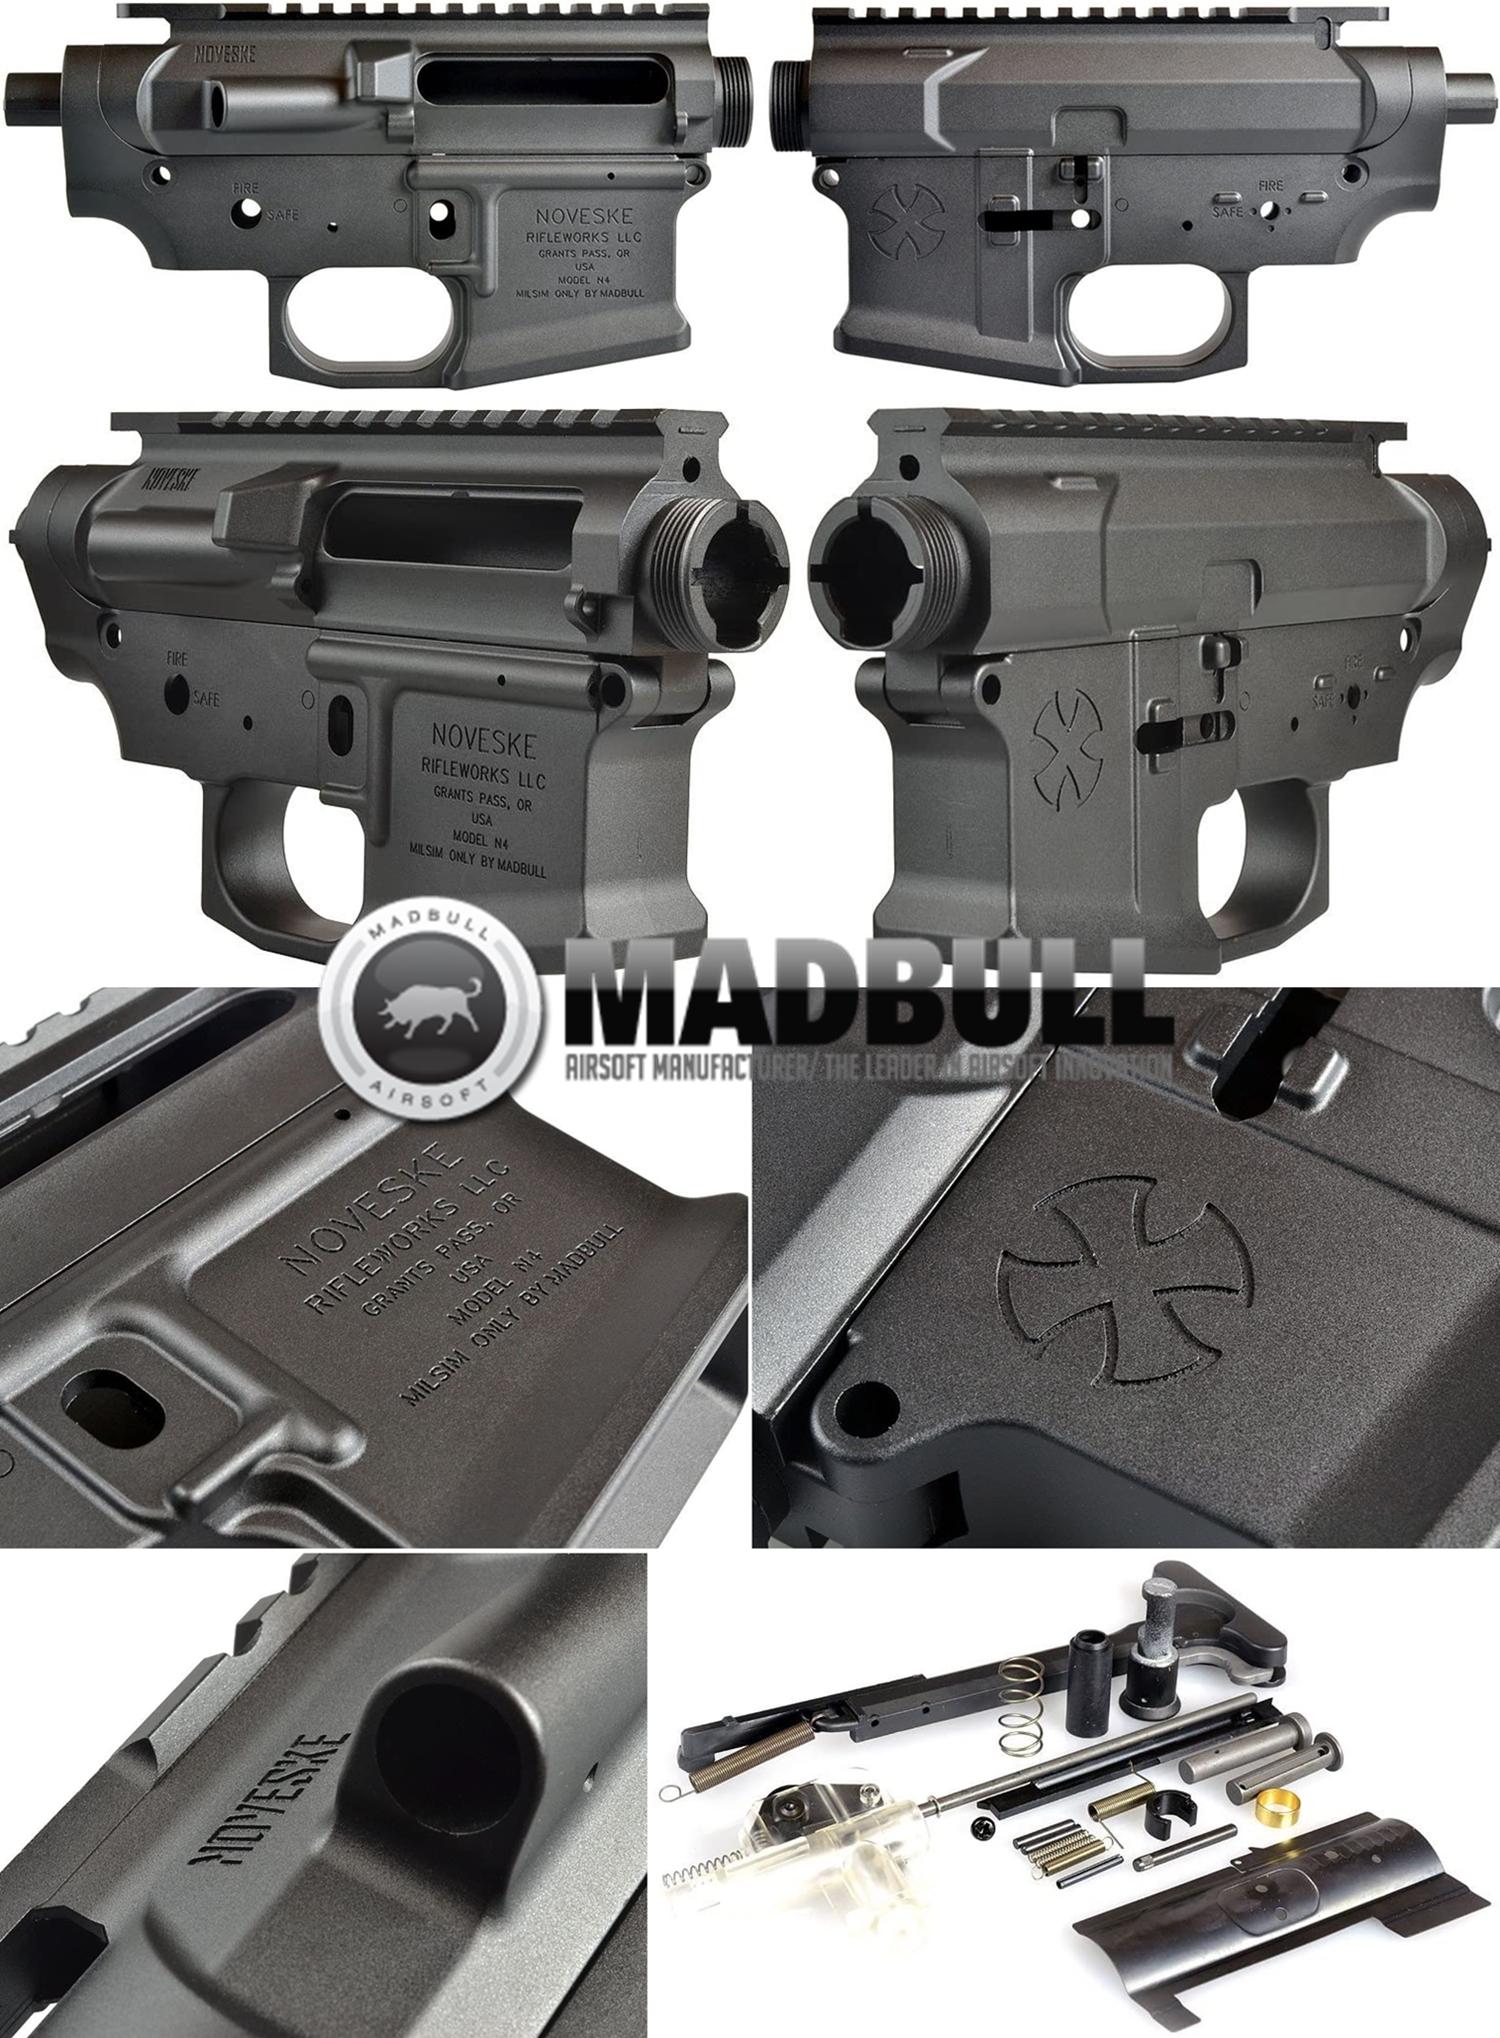 00 NOVESKE GEN3 N4 BY MADBULL!! 『第一弾』 新たにSTD民間系ARを作り始めたいと思います!! STD AR-15 M4 スタンダード 電動ガン マルイ ノベスケ ノベスキー マットブル メタルフレーム 動作テスト 組込 取付 カス